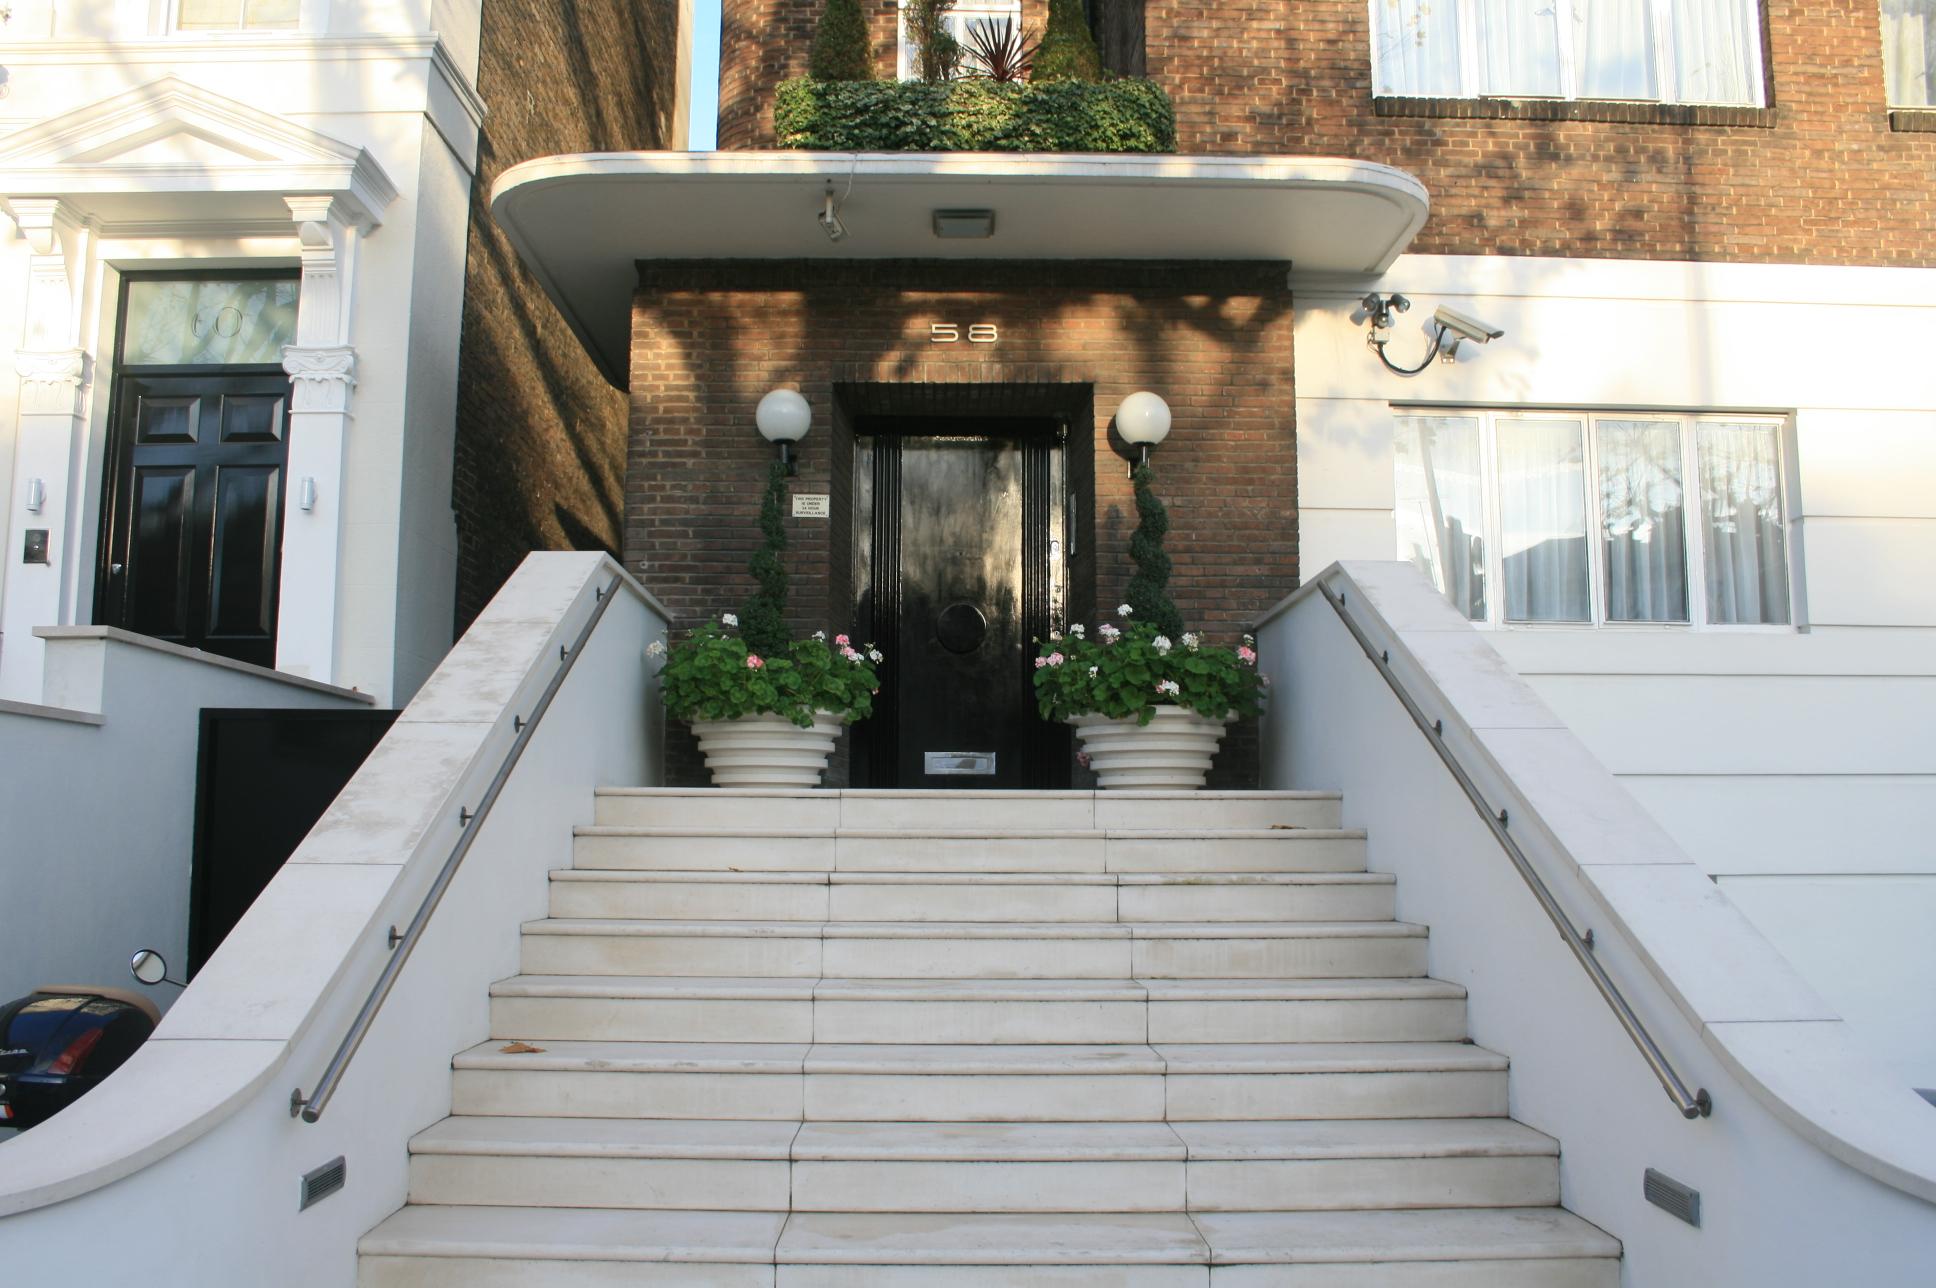 File:58 Hamilton Terrace Staircase